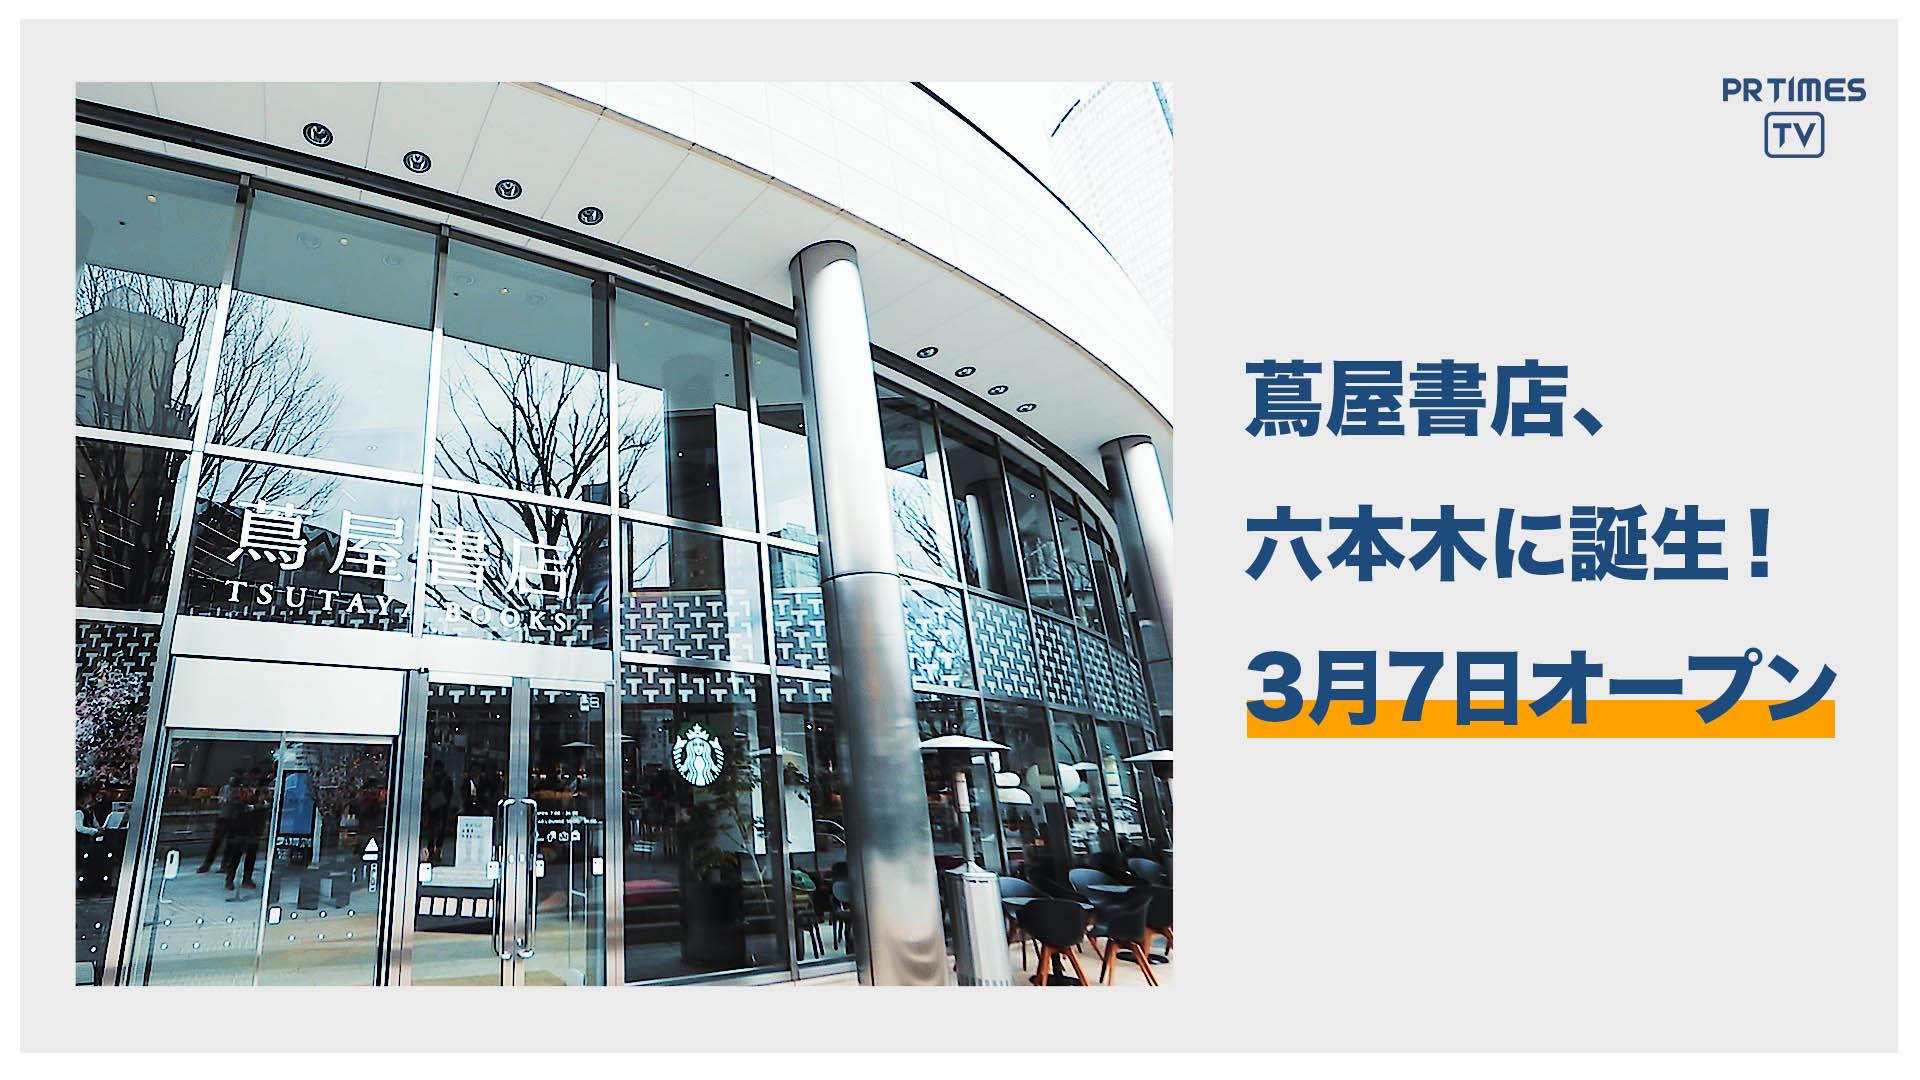 TSUTAYA TOKYO ROPPONGIがリニューアル 「六本木 蔦屋書店」として3月7日オープン!